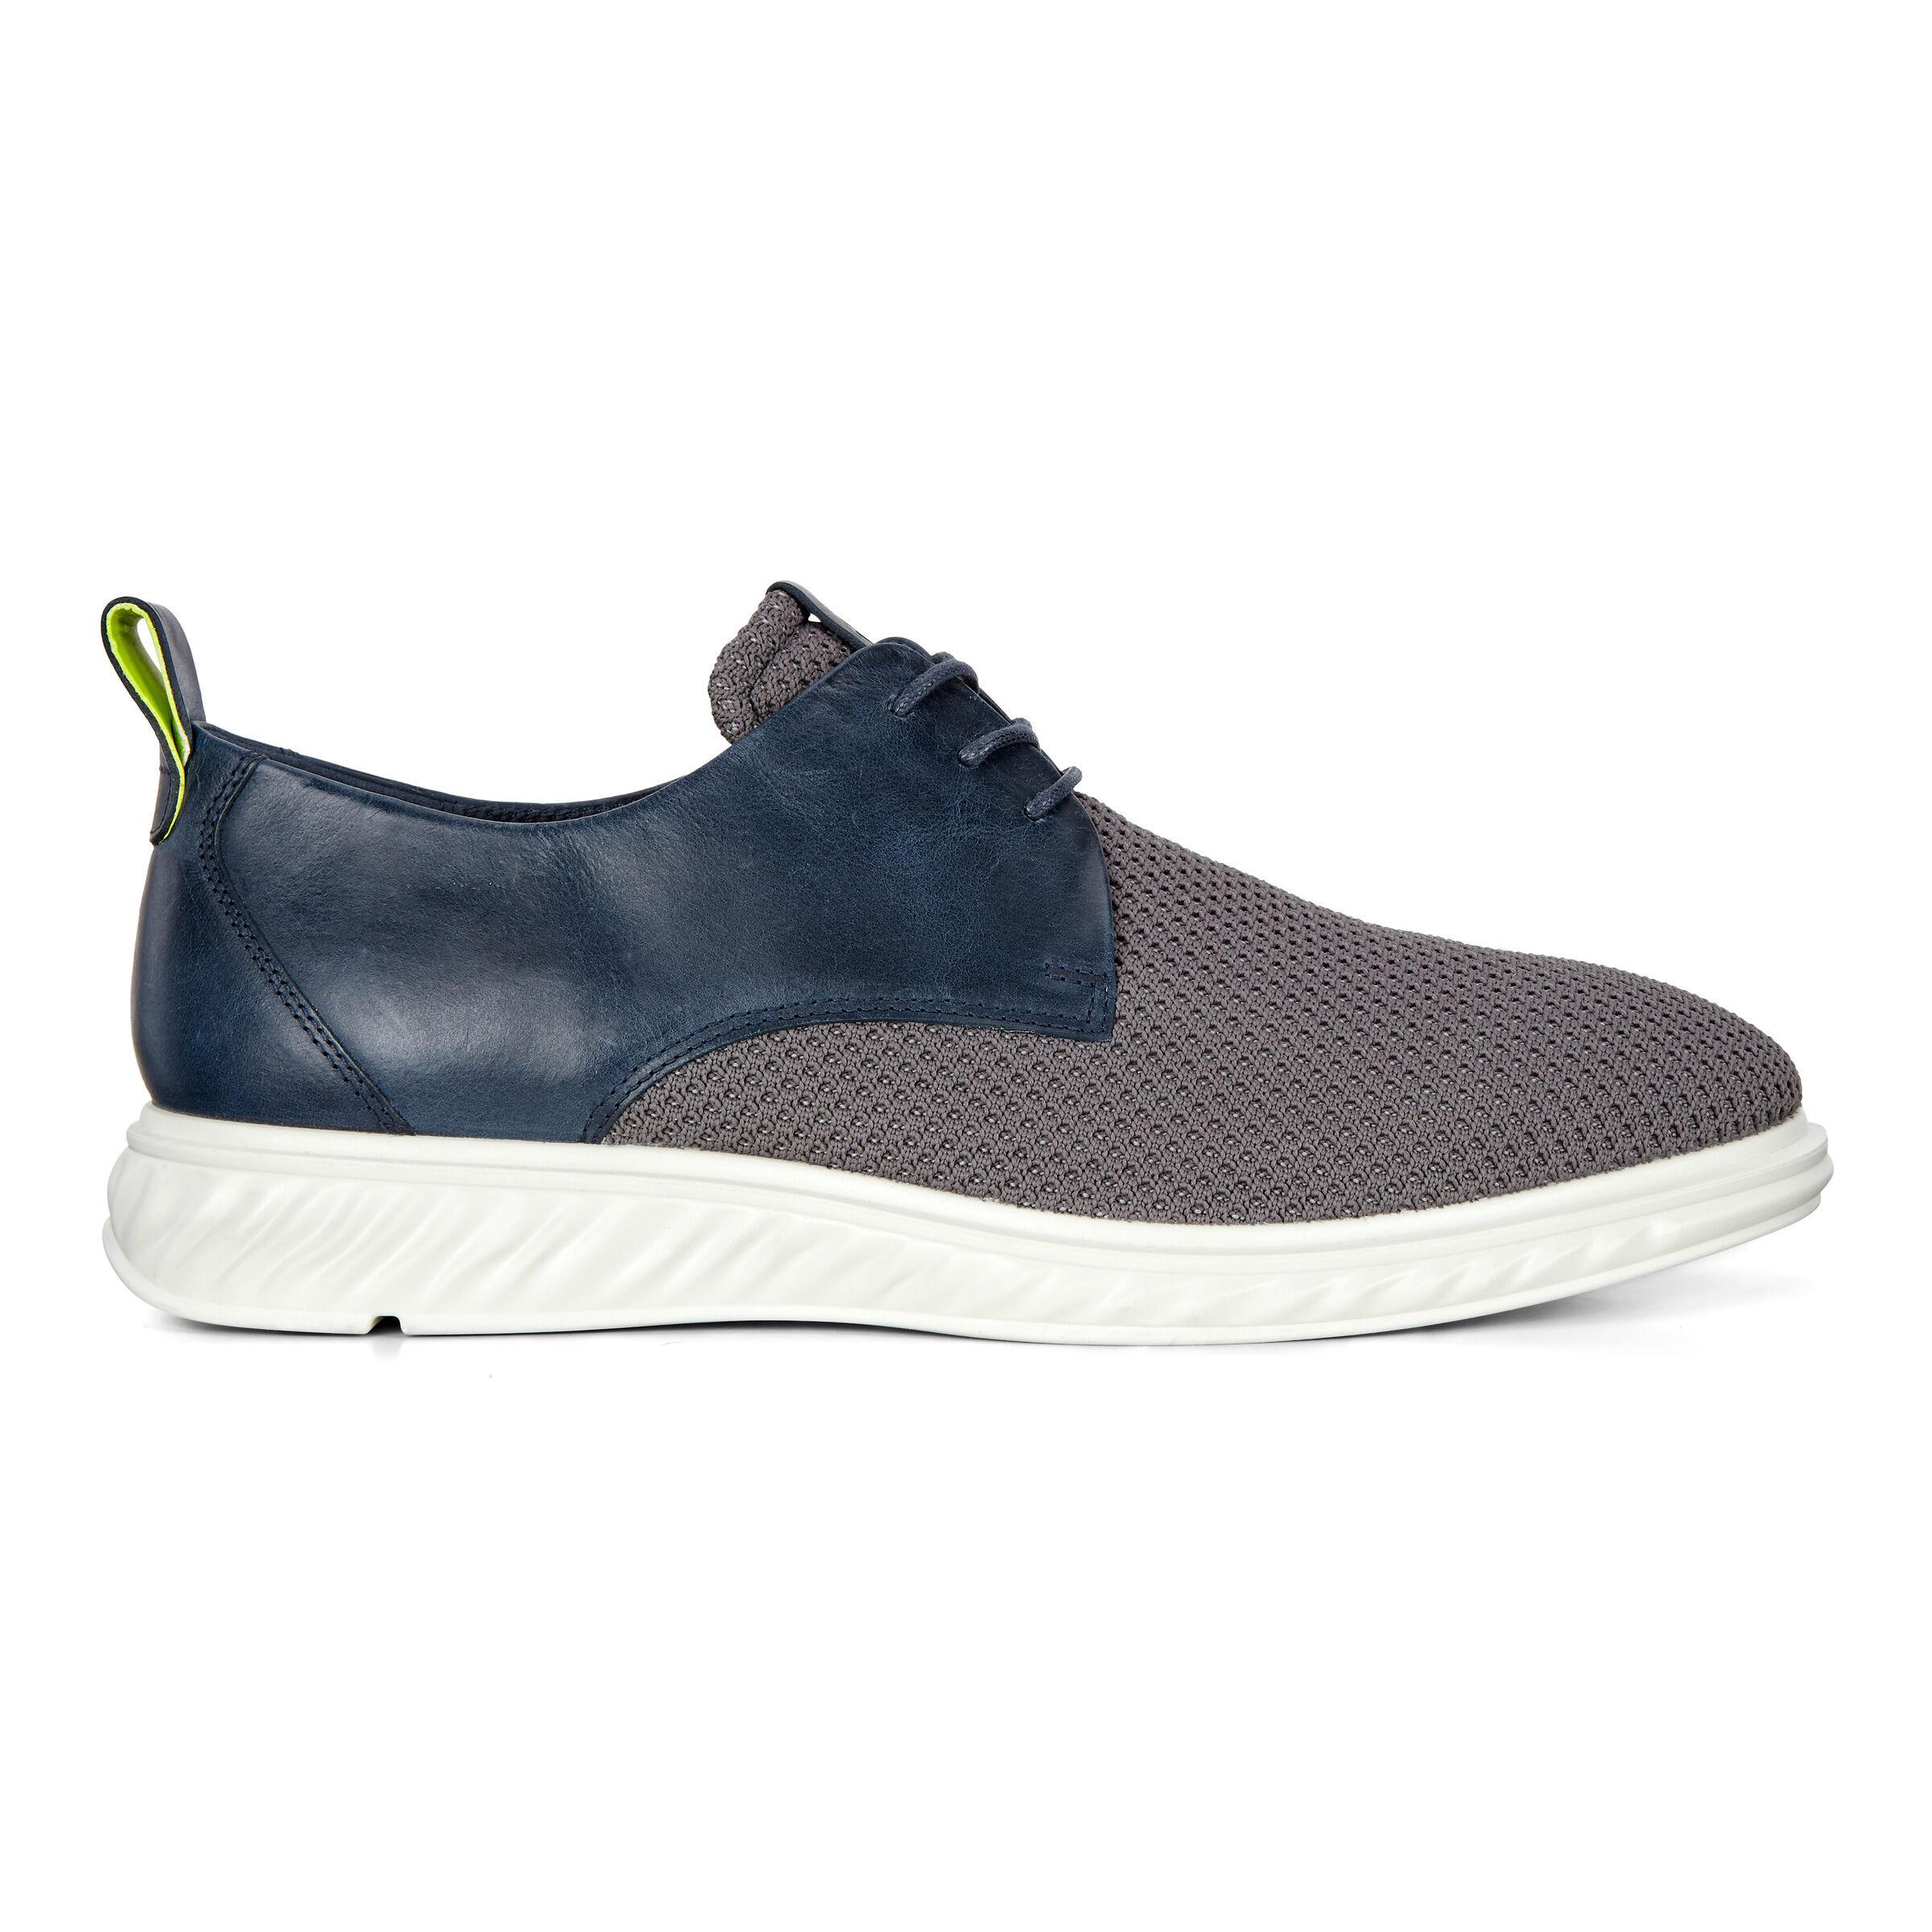 ECCO St. 1 Hybrid Lite Shoes: 13 - Titanium